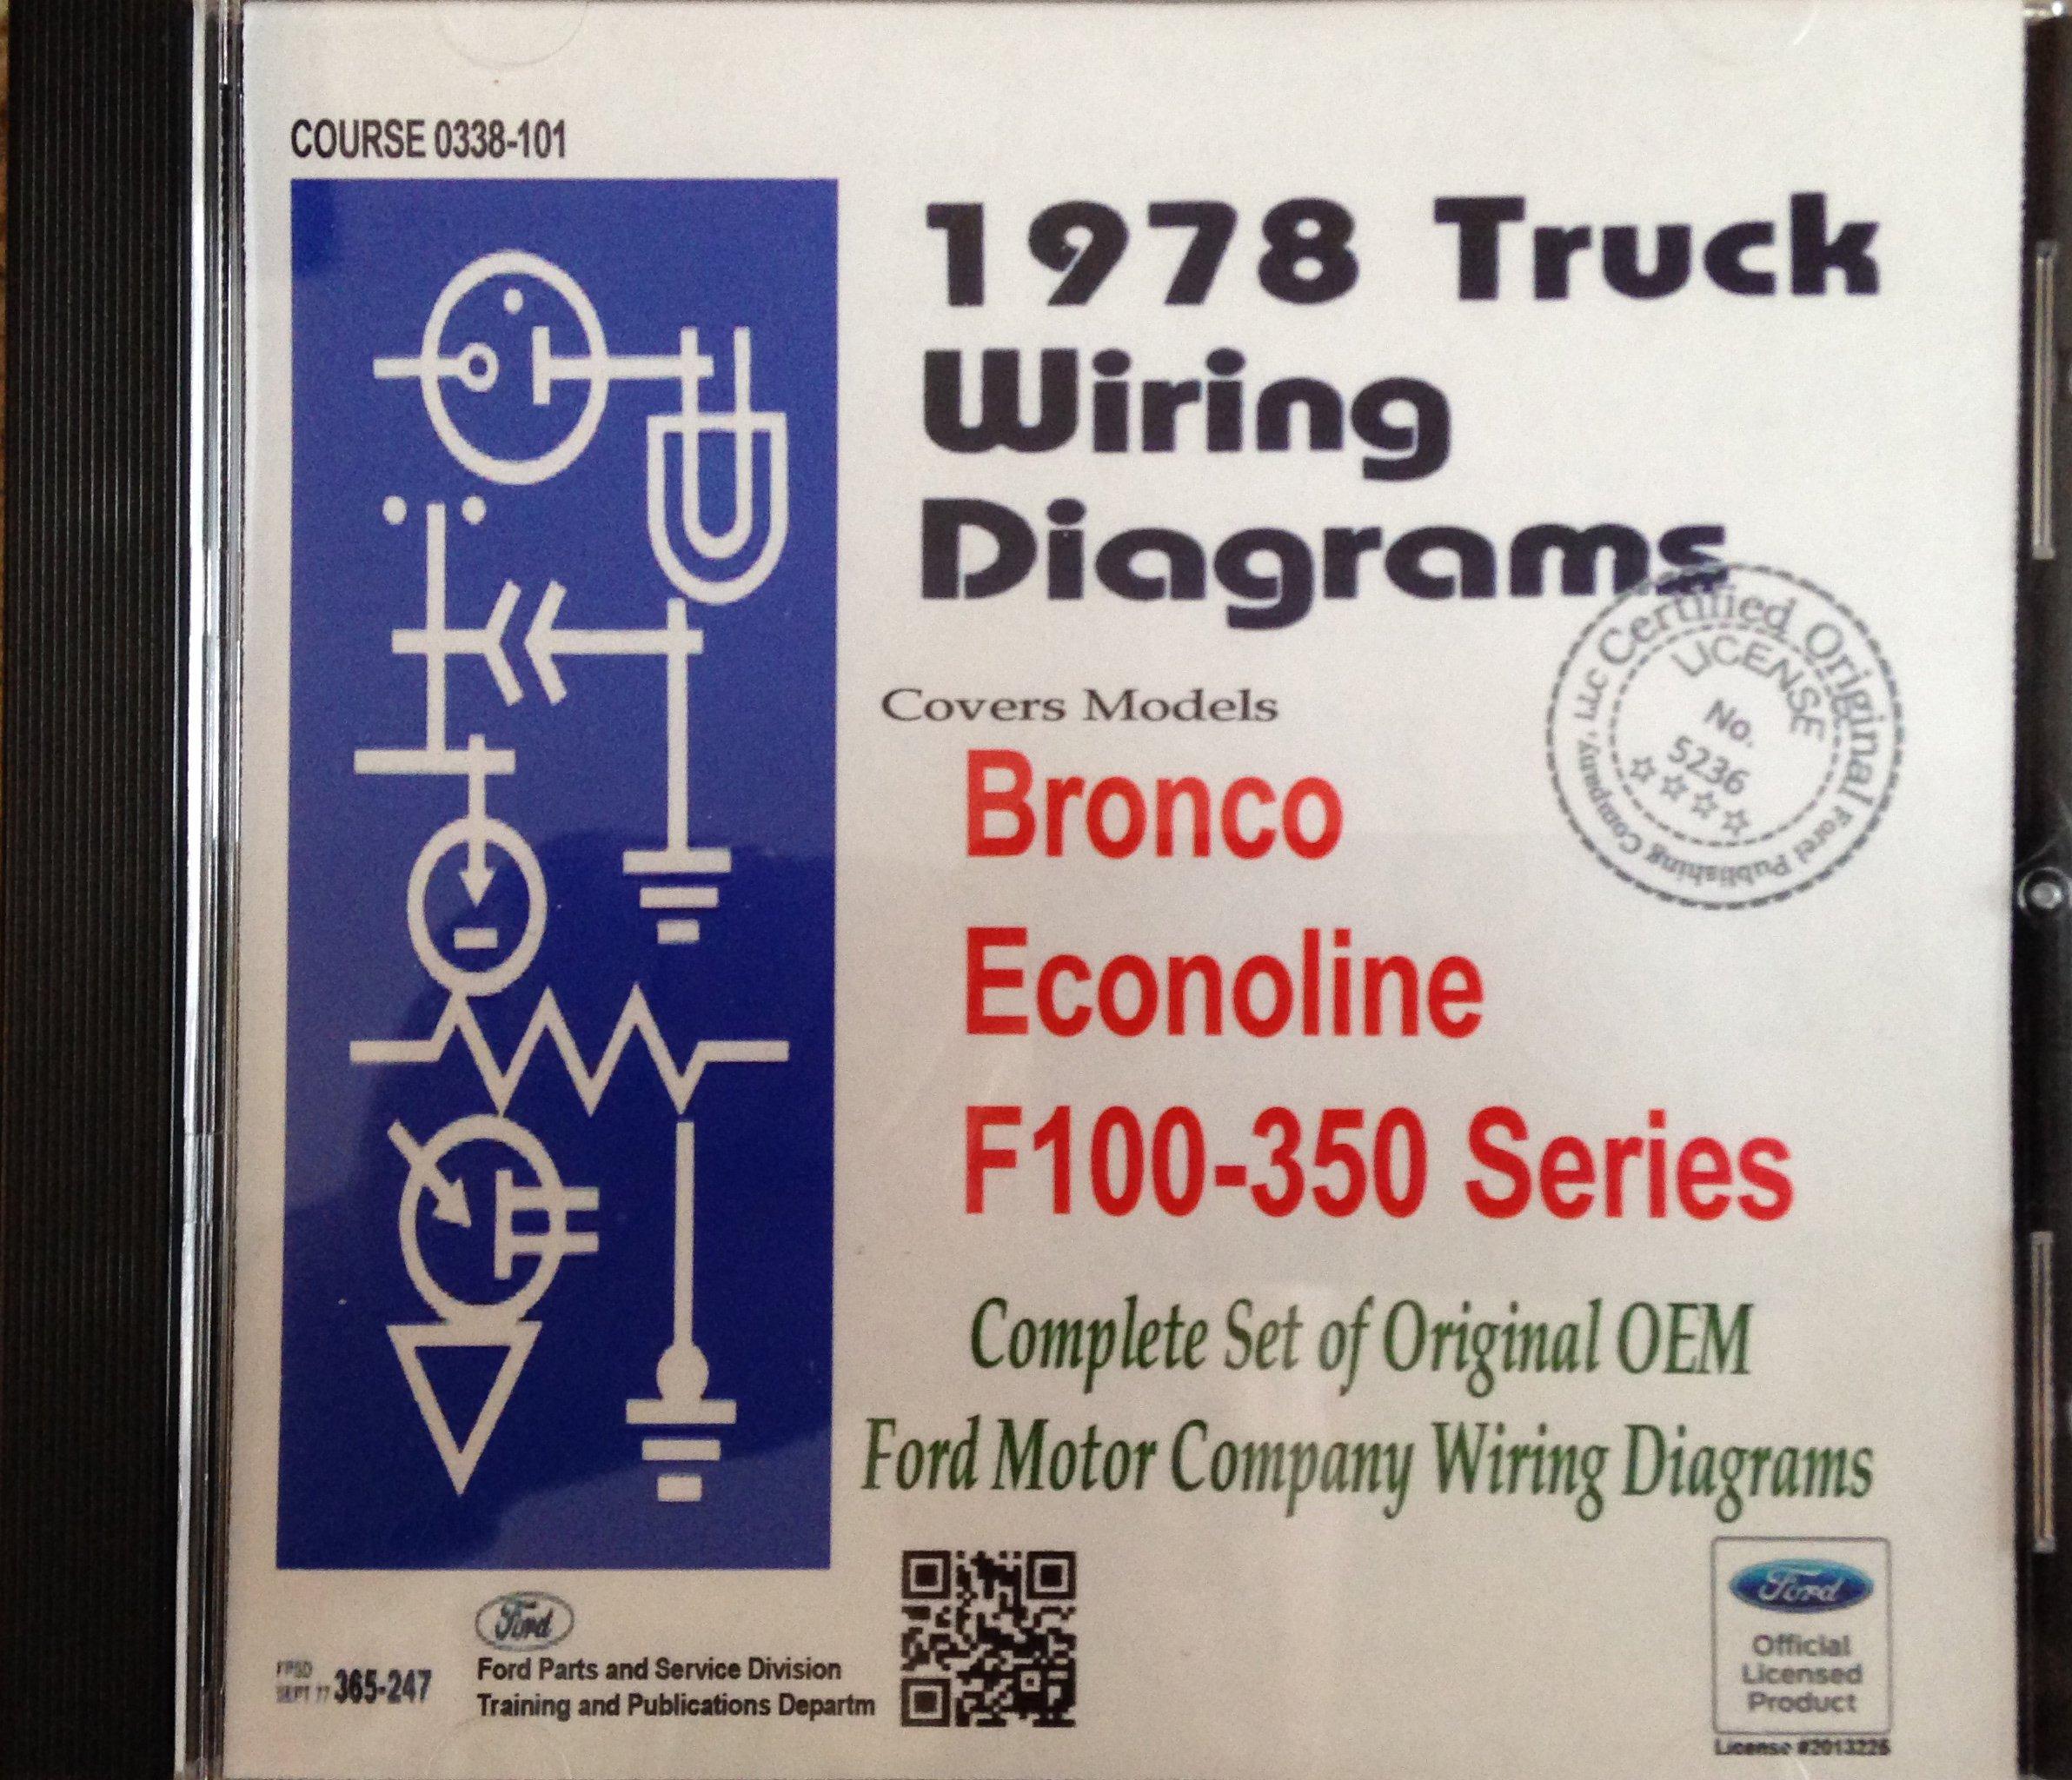 1978 Ford Truck Wiring Diagrams (Bronco, Econoline, F100-350 Series): Ford  Motor Company: 9781603712064: Amazon.com: Books